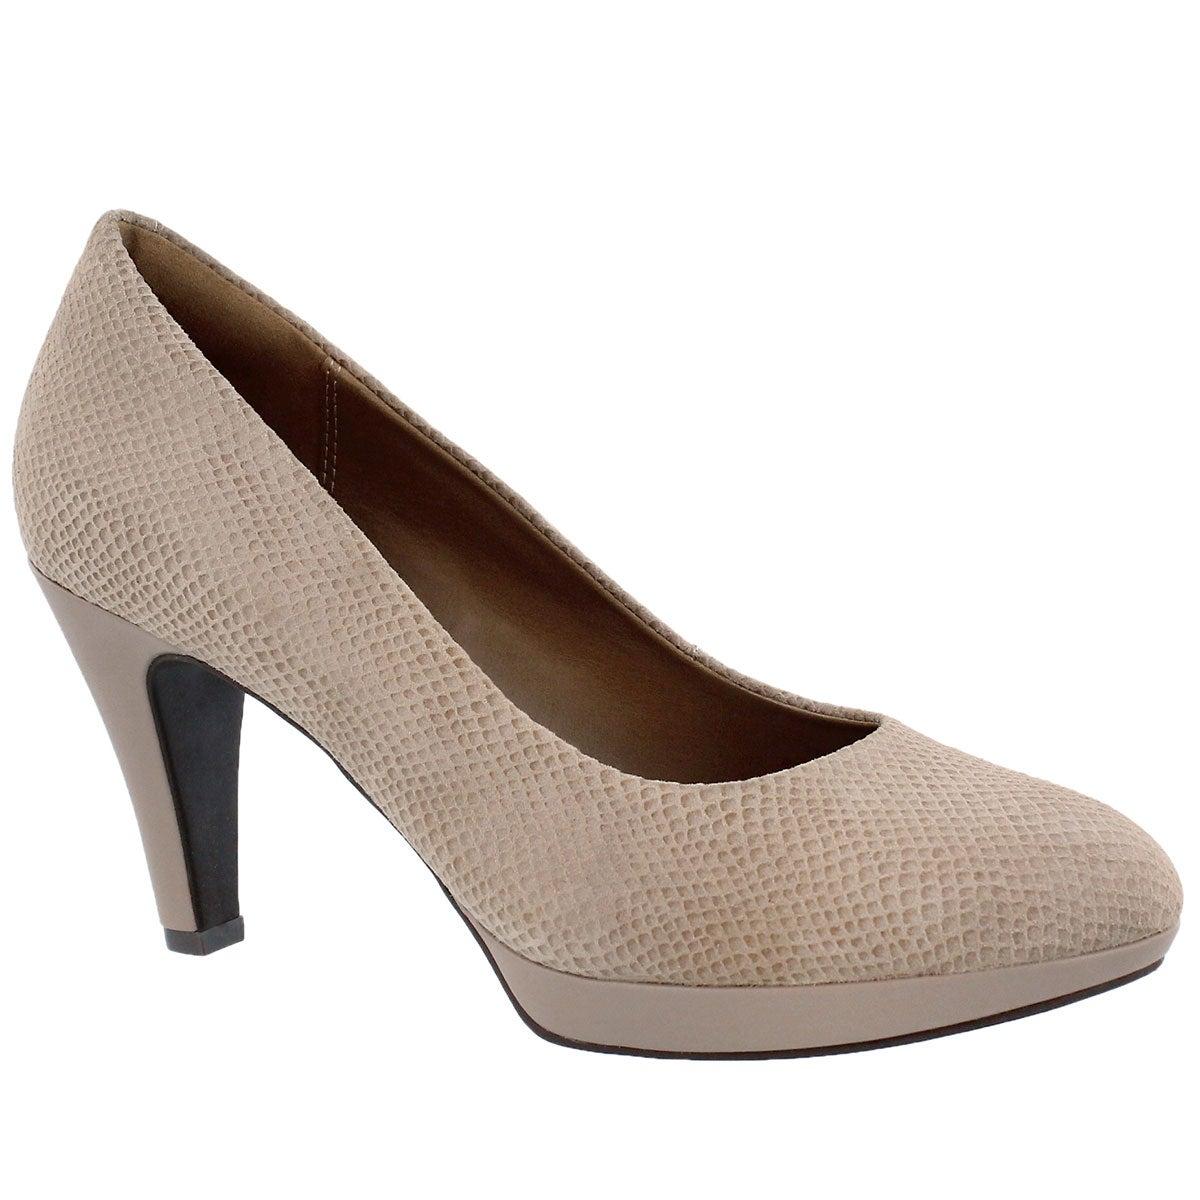 Women's BRIER DOLLY sand snake dress heels